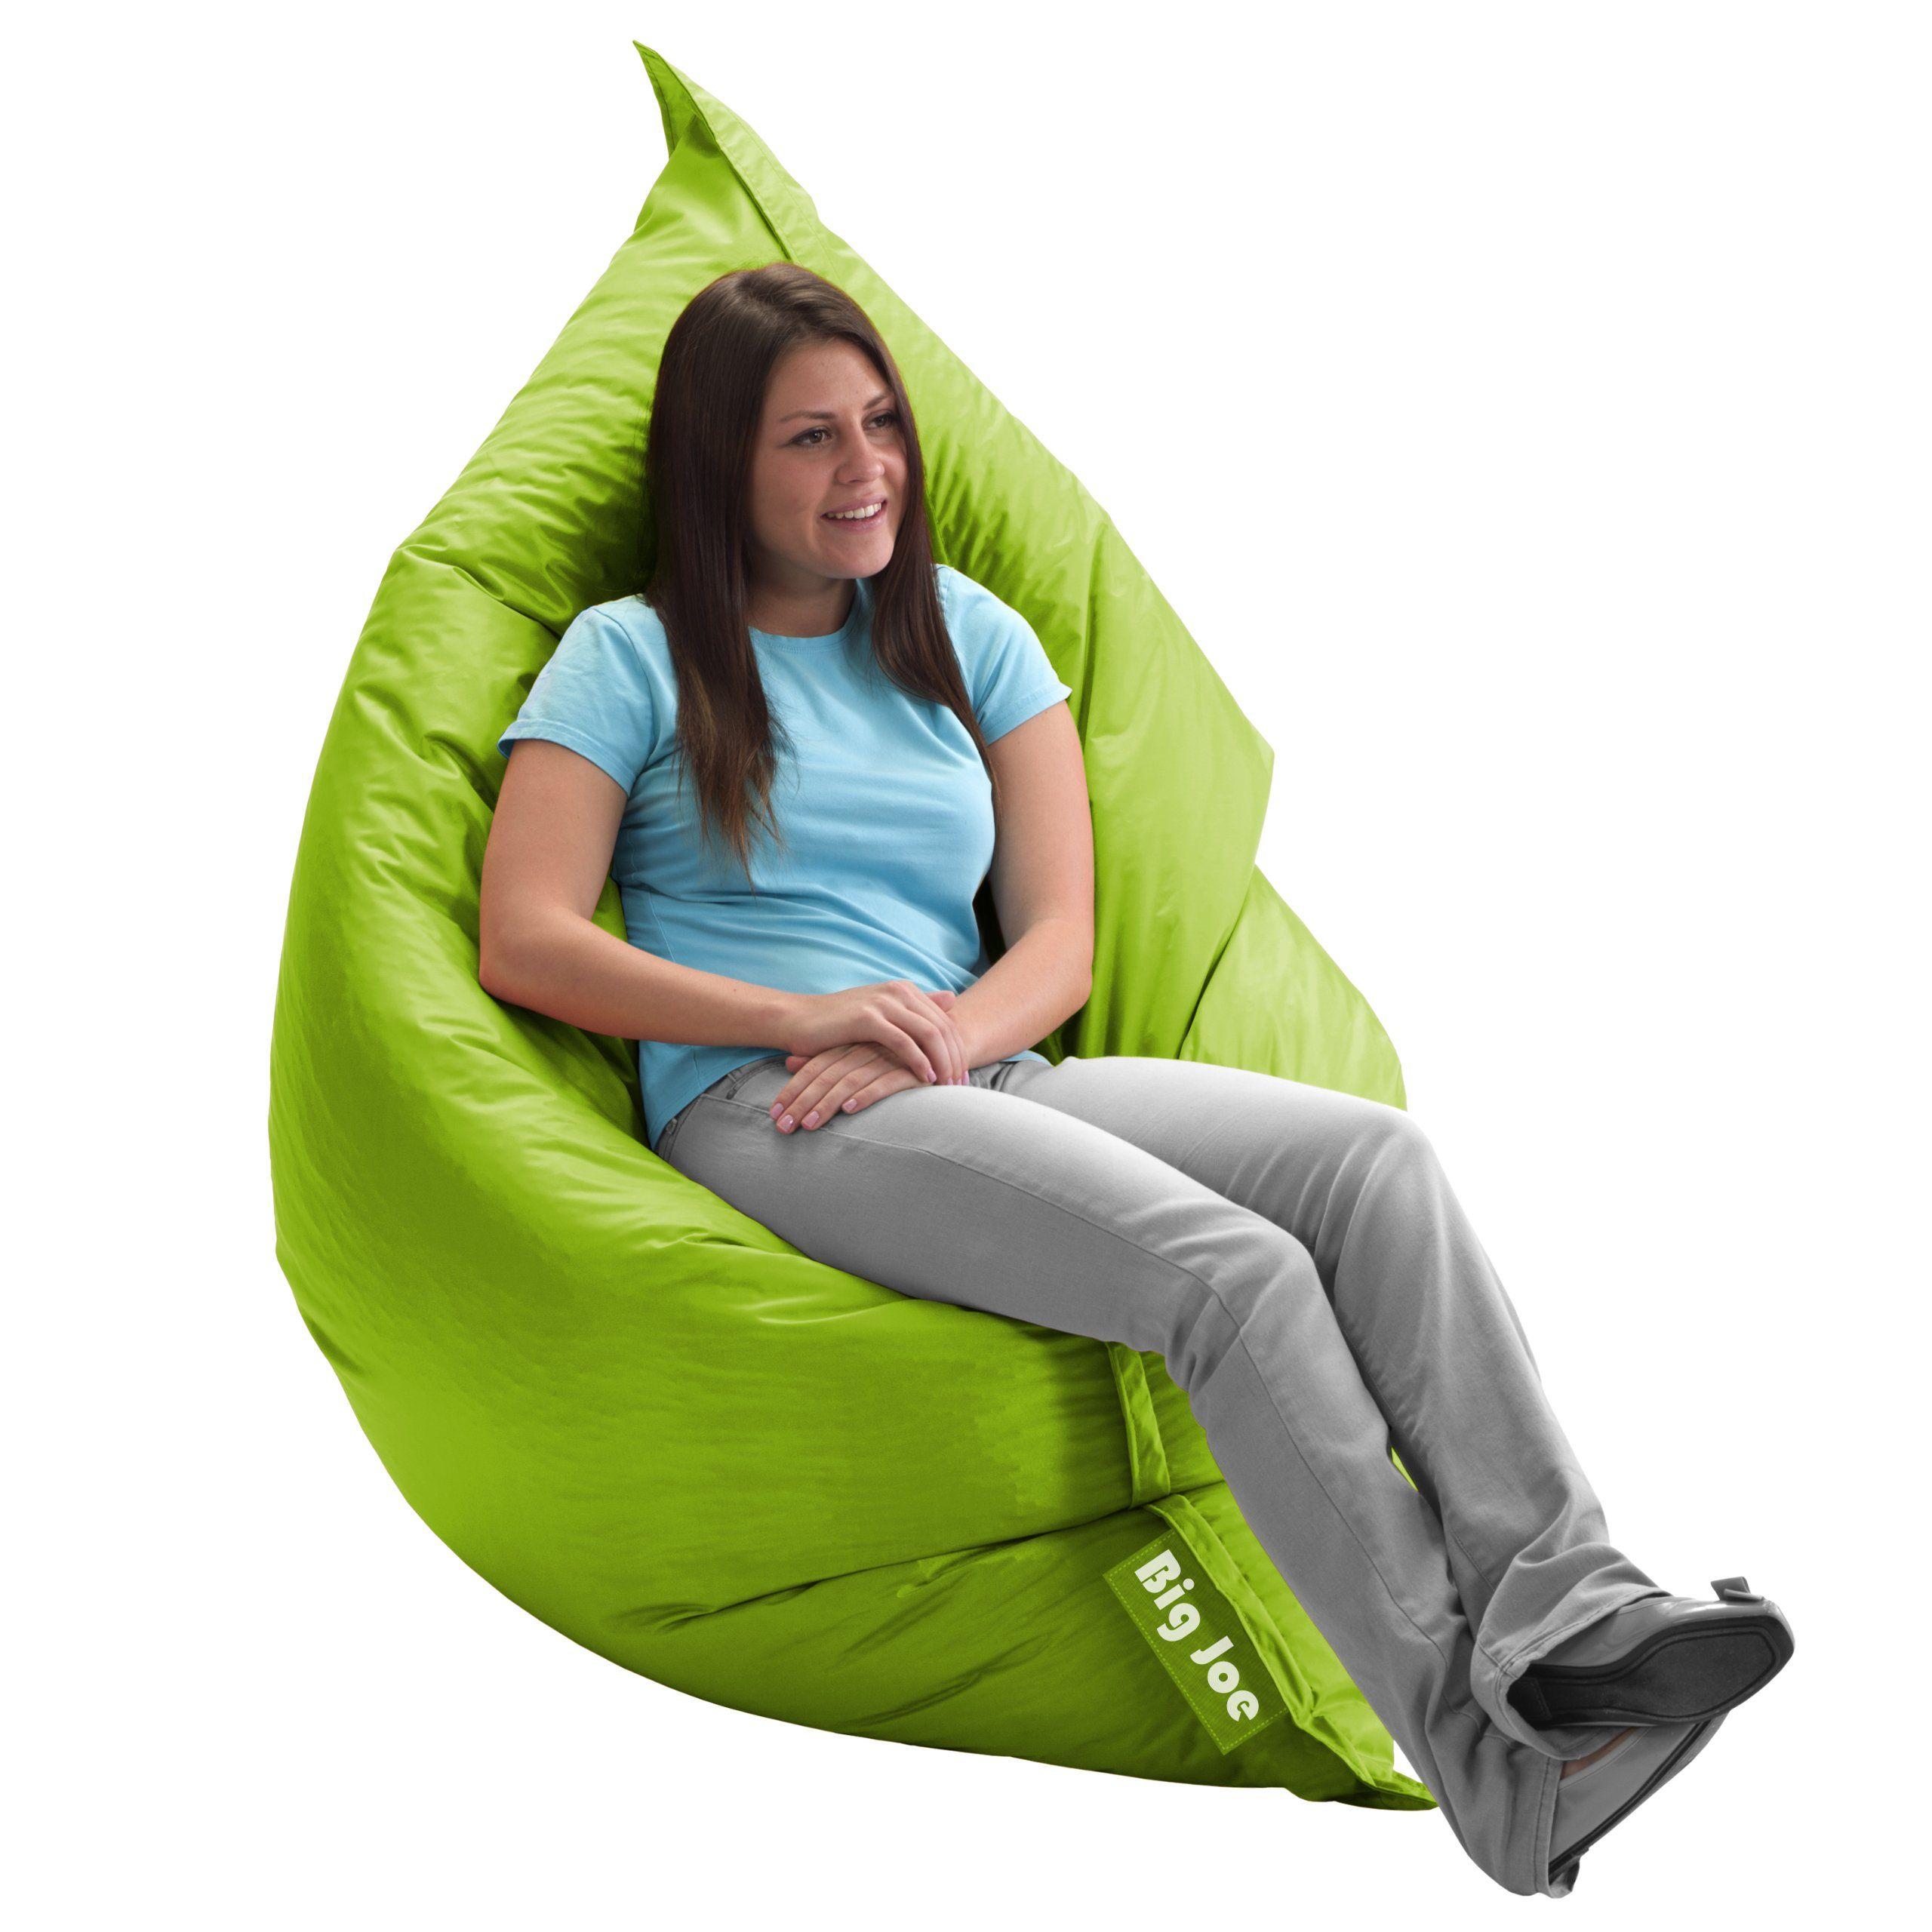 les solutions lifestyle equipment tm original furniture qatar product fatboy